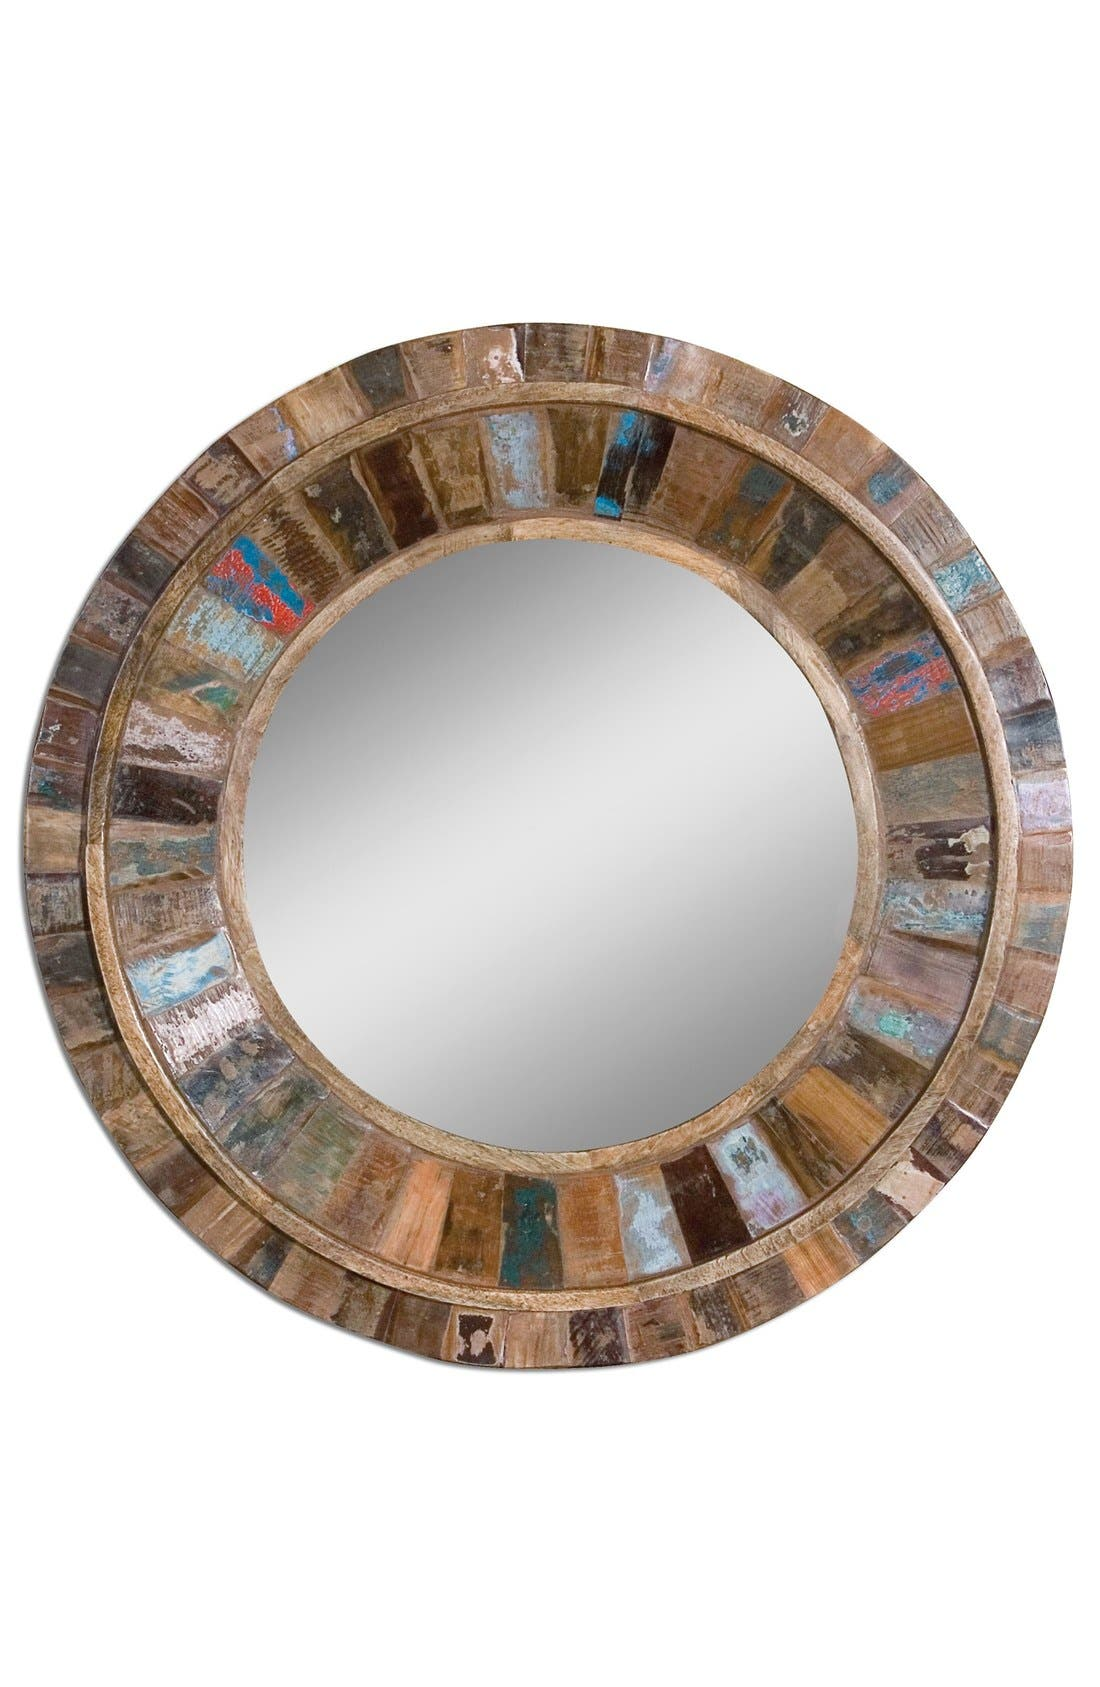 'Jeremiah' Round Wooden Wall Mirror,                             Main thumbnail 1, color,                             200